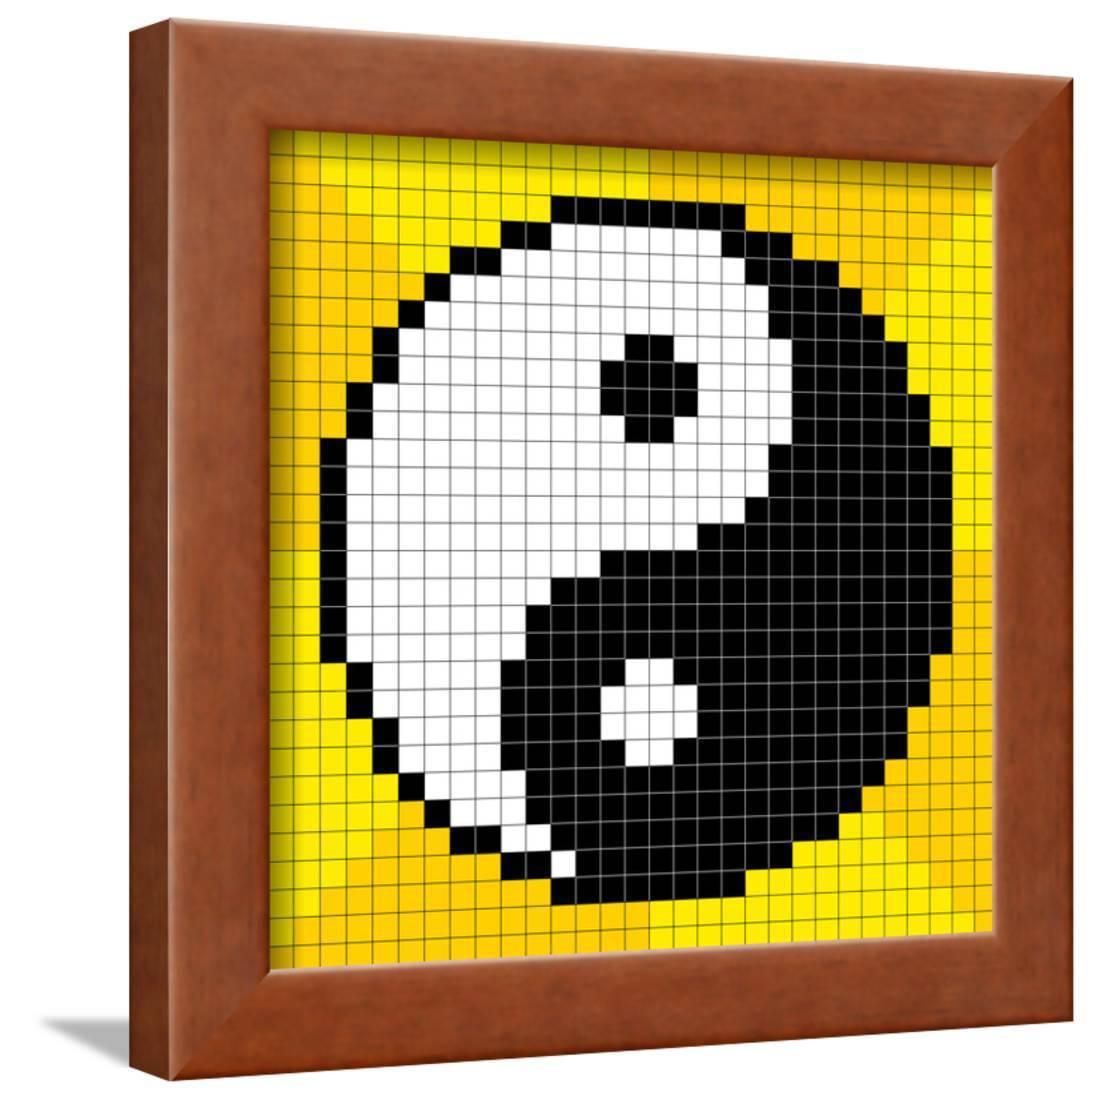 8 Bit Pixel Art Yin Yang Symbol Framed Print Wall Art By